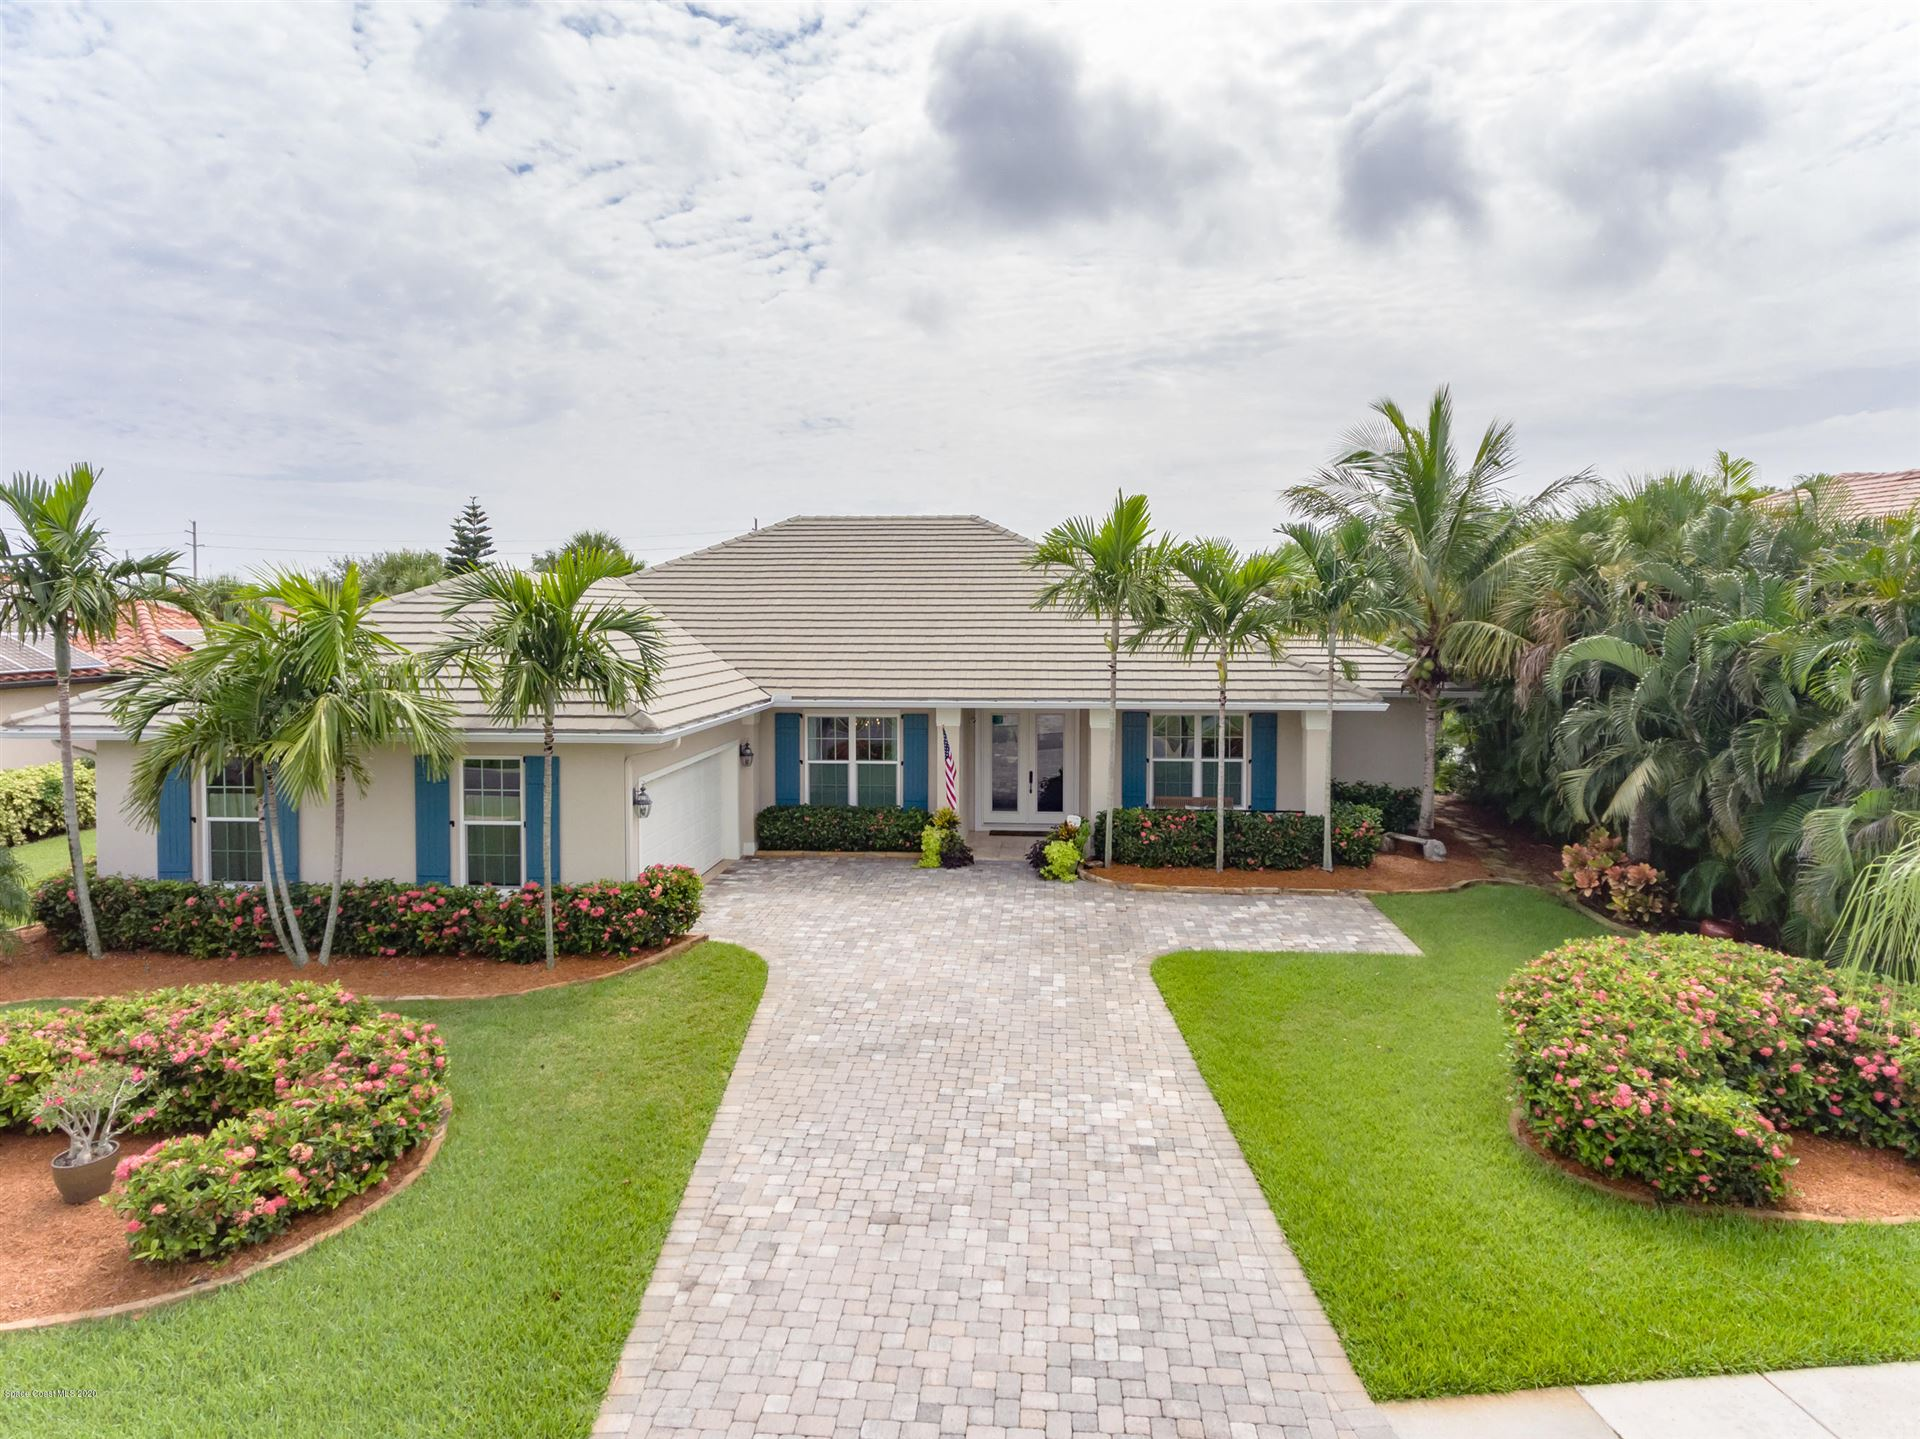 133 Island View Drive, Indian Harbour Beach, FL 32937 - #: 881797